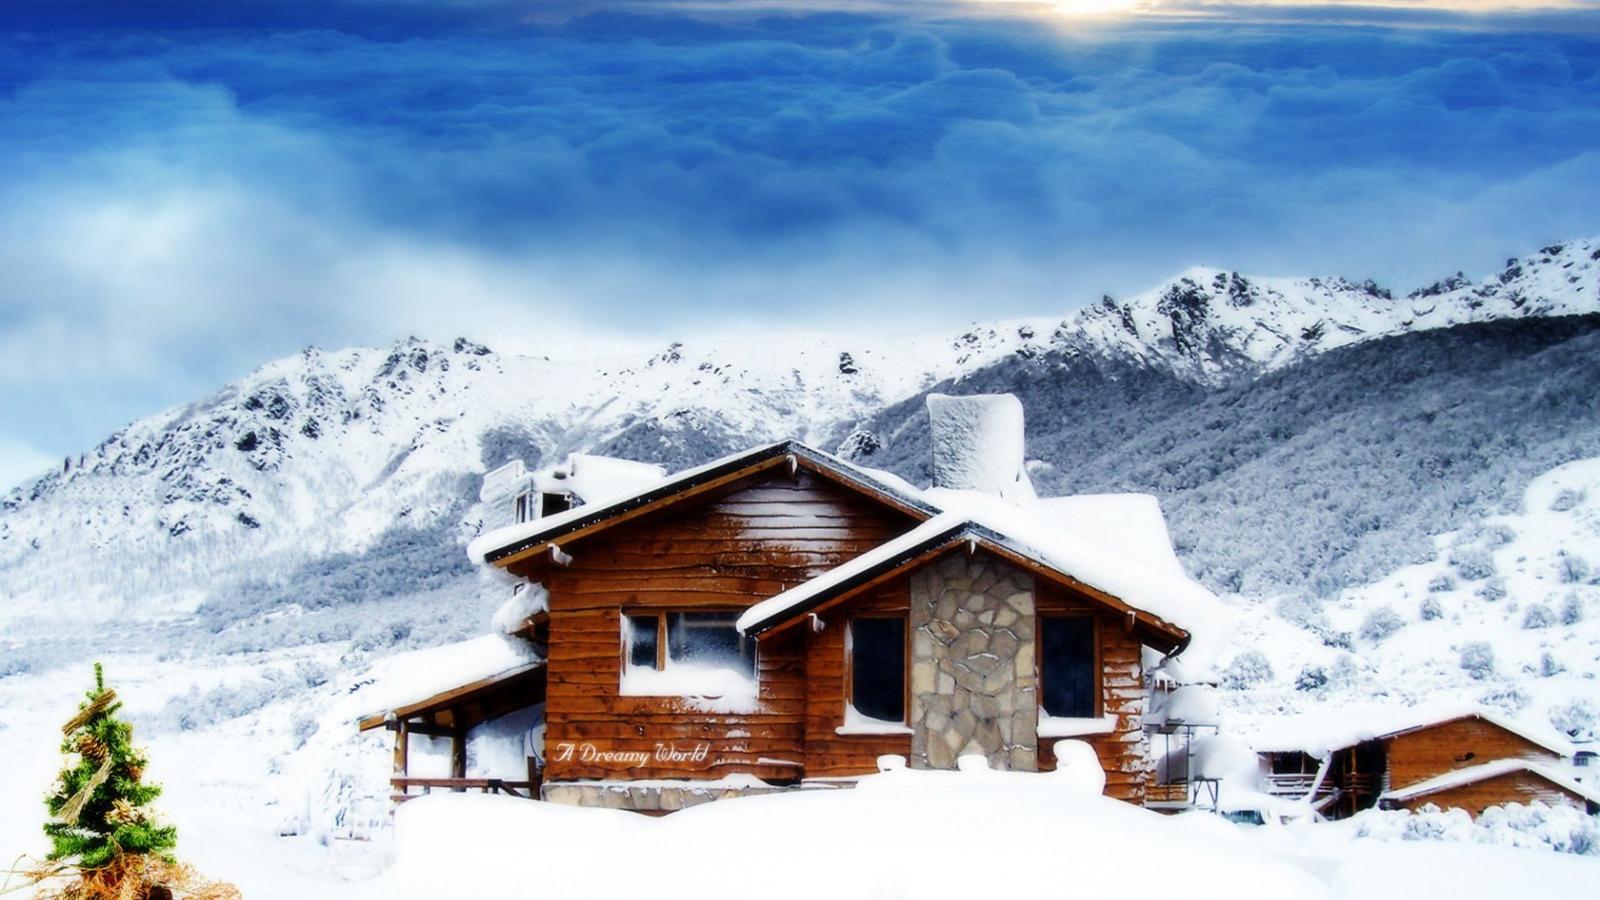 1600x900 hd desktop wallpaper winter - photo #9